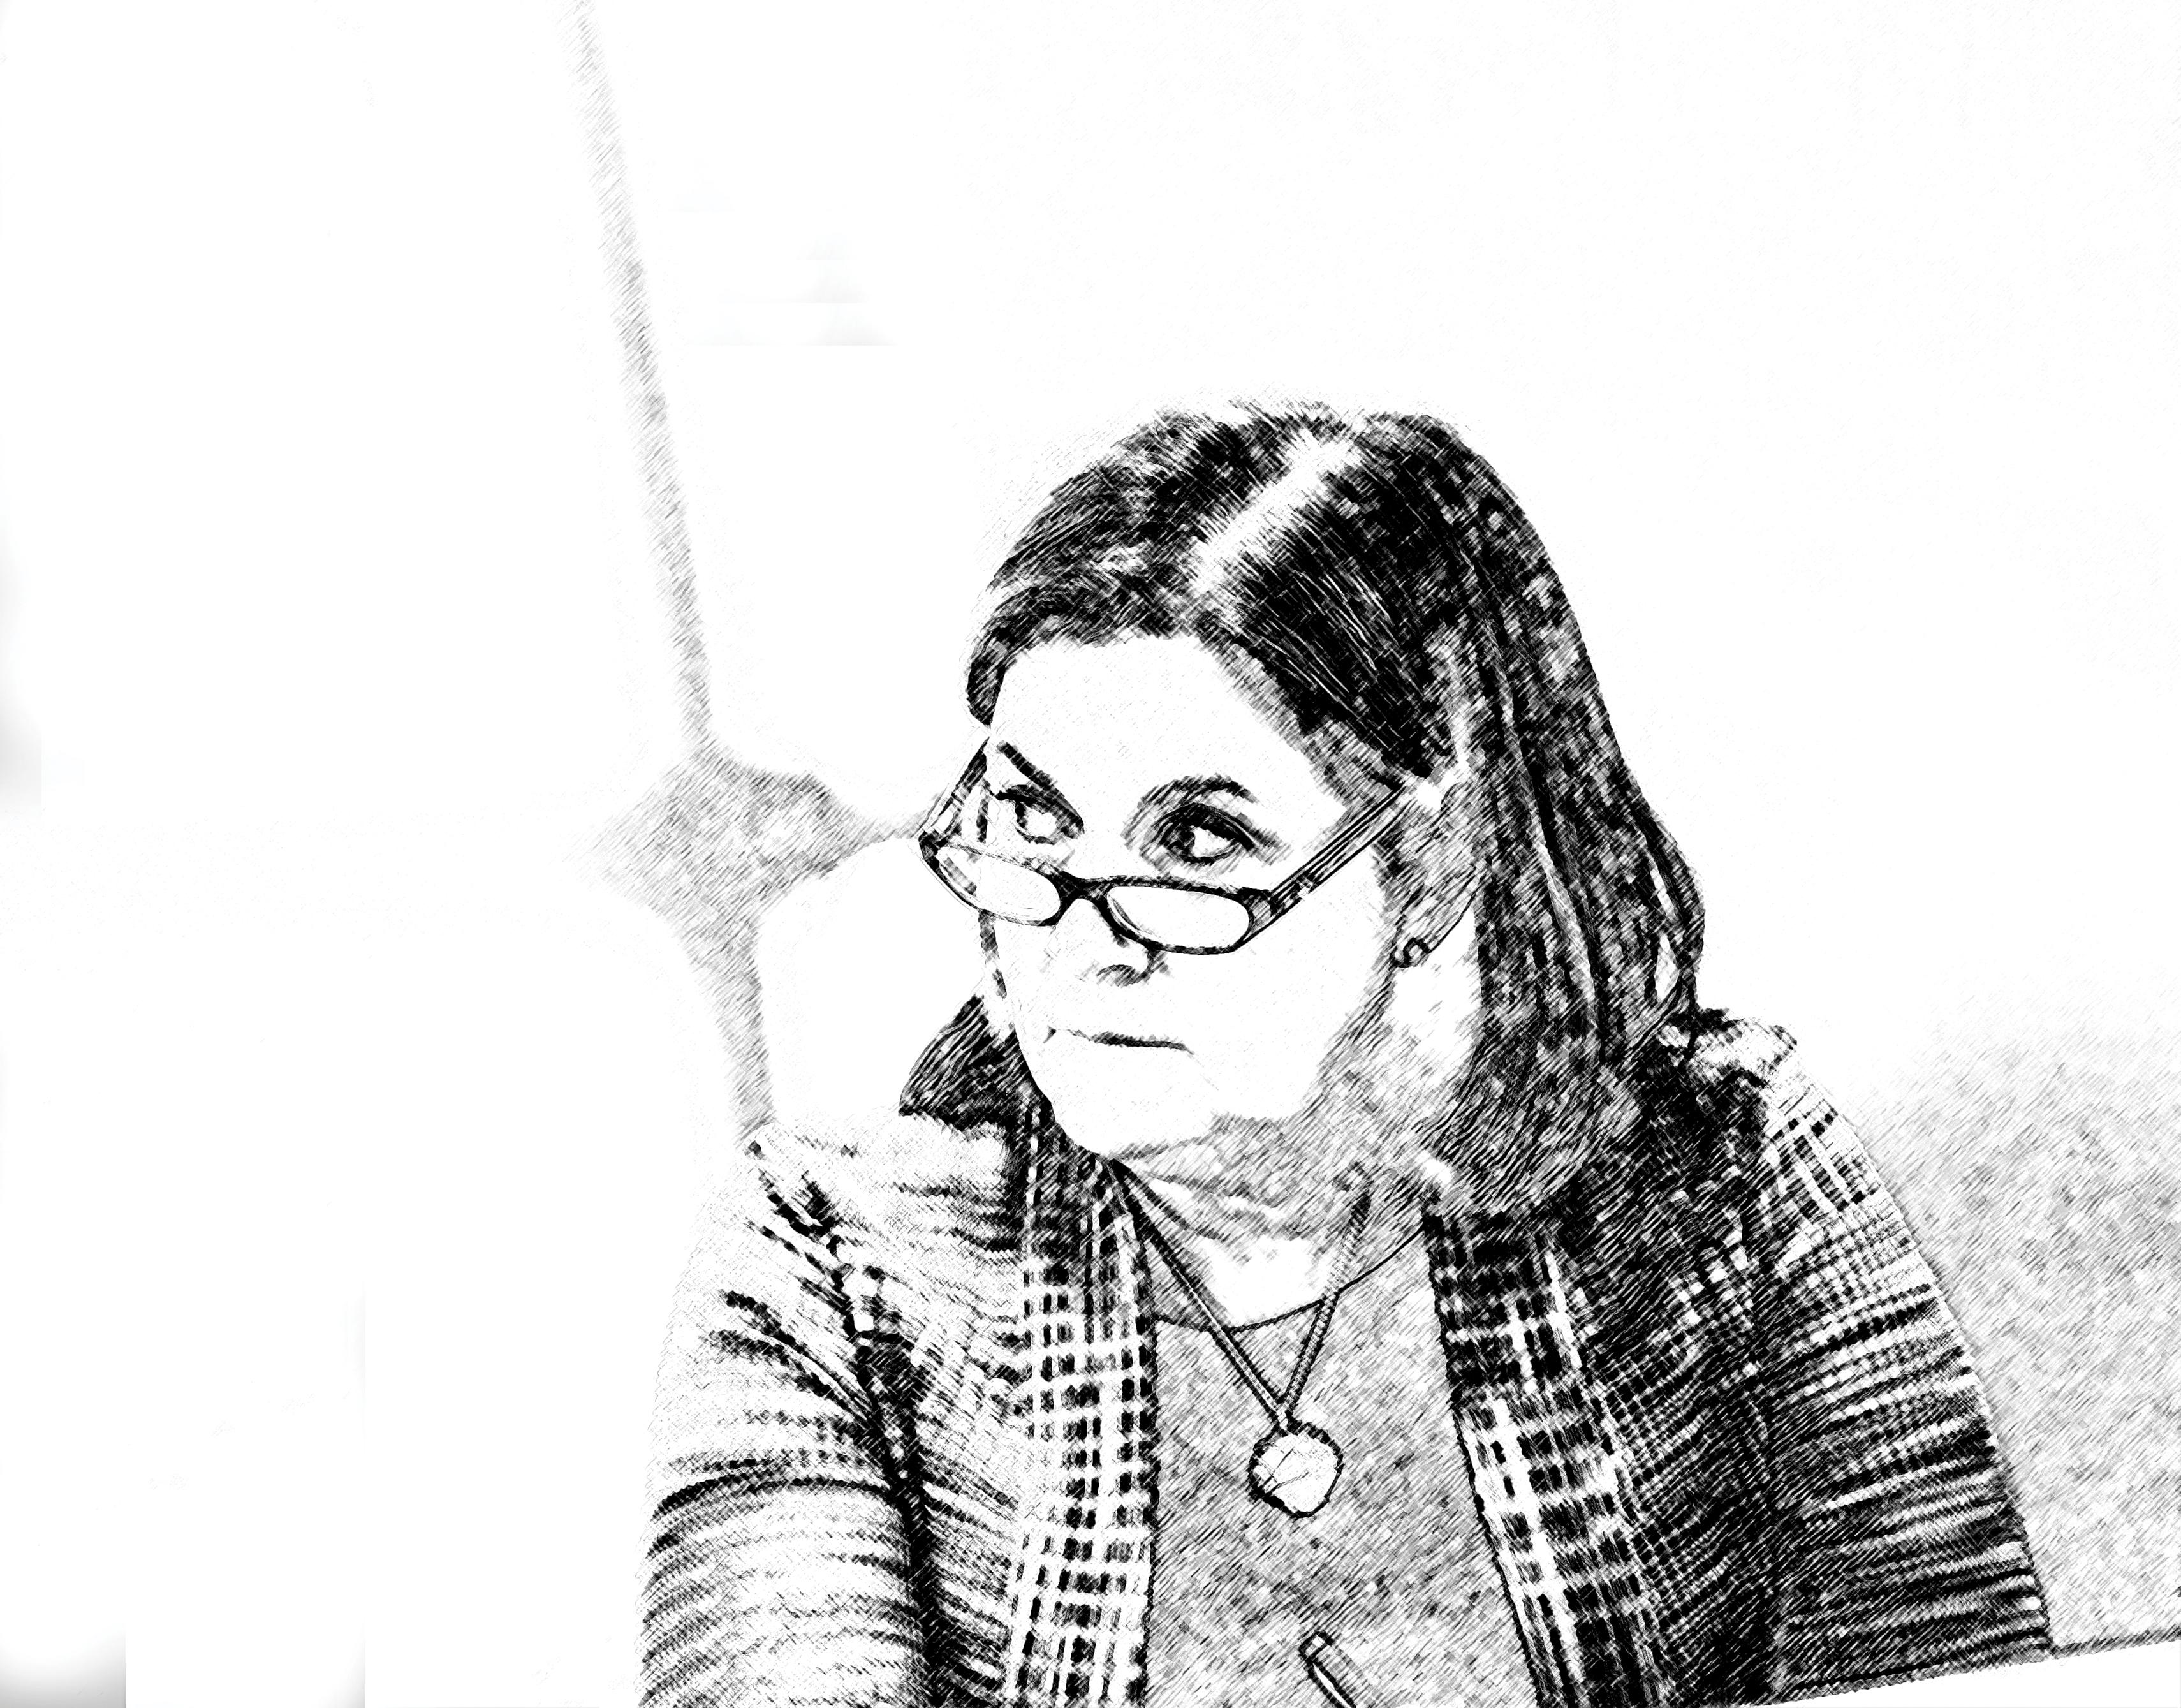 https://assets.sourcemedia.com/c6/f0/54999be343d3aa799eb89b12eb0b/george-esther-sketch.jpg